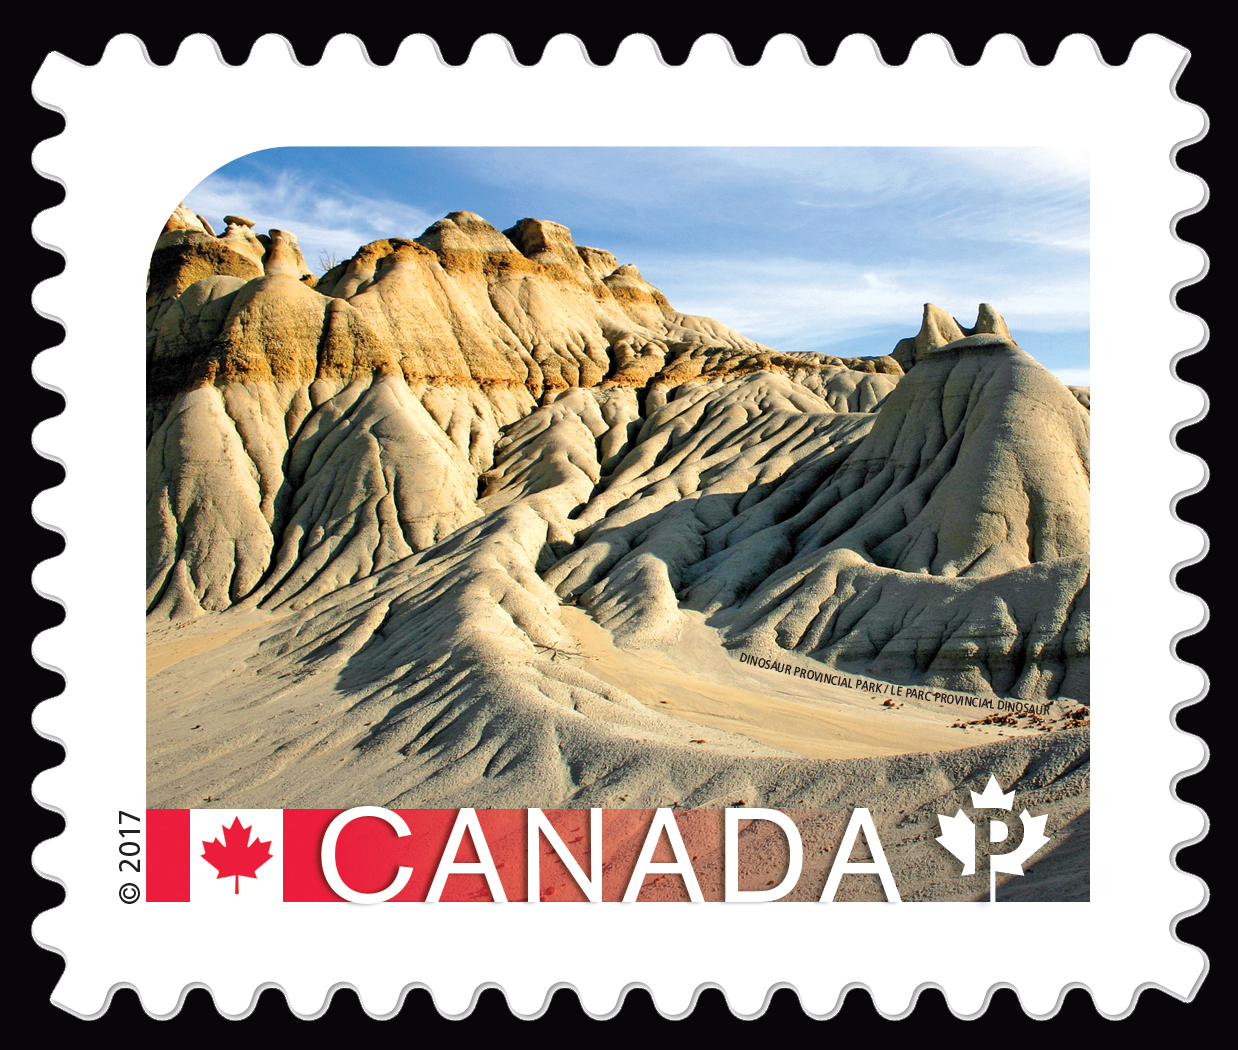 Dinosaur Provincial Park - UNESCO World Heritage Site Canada Postage Stamp | UNESCO World Heritage Sites inCanada